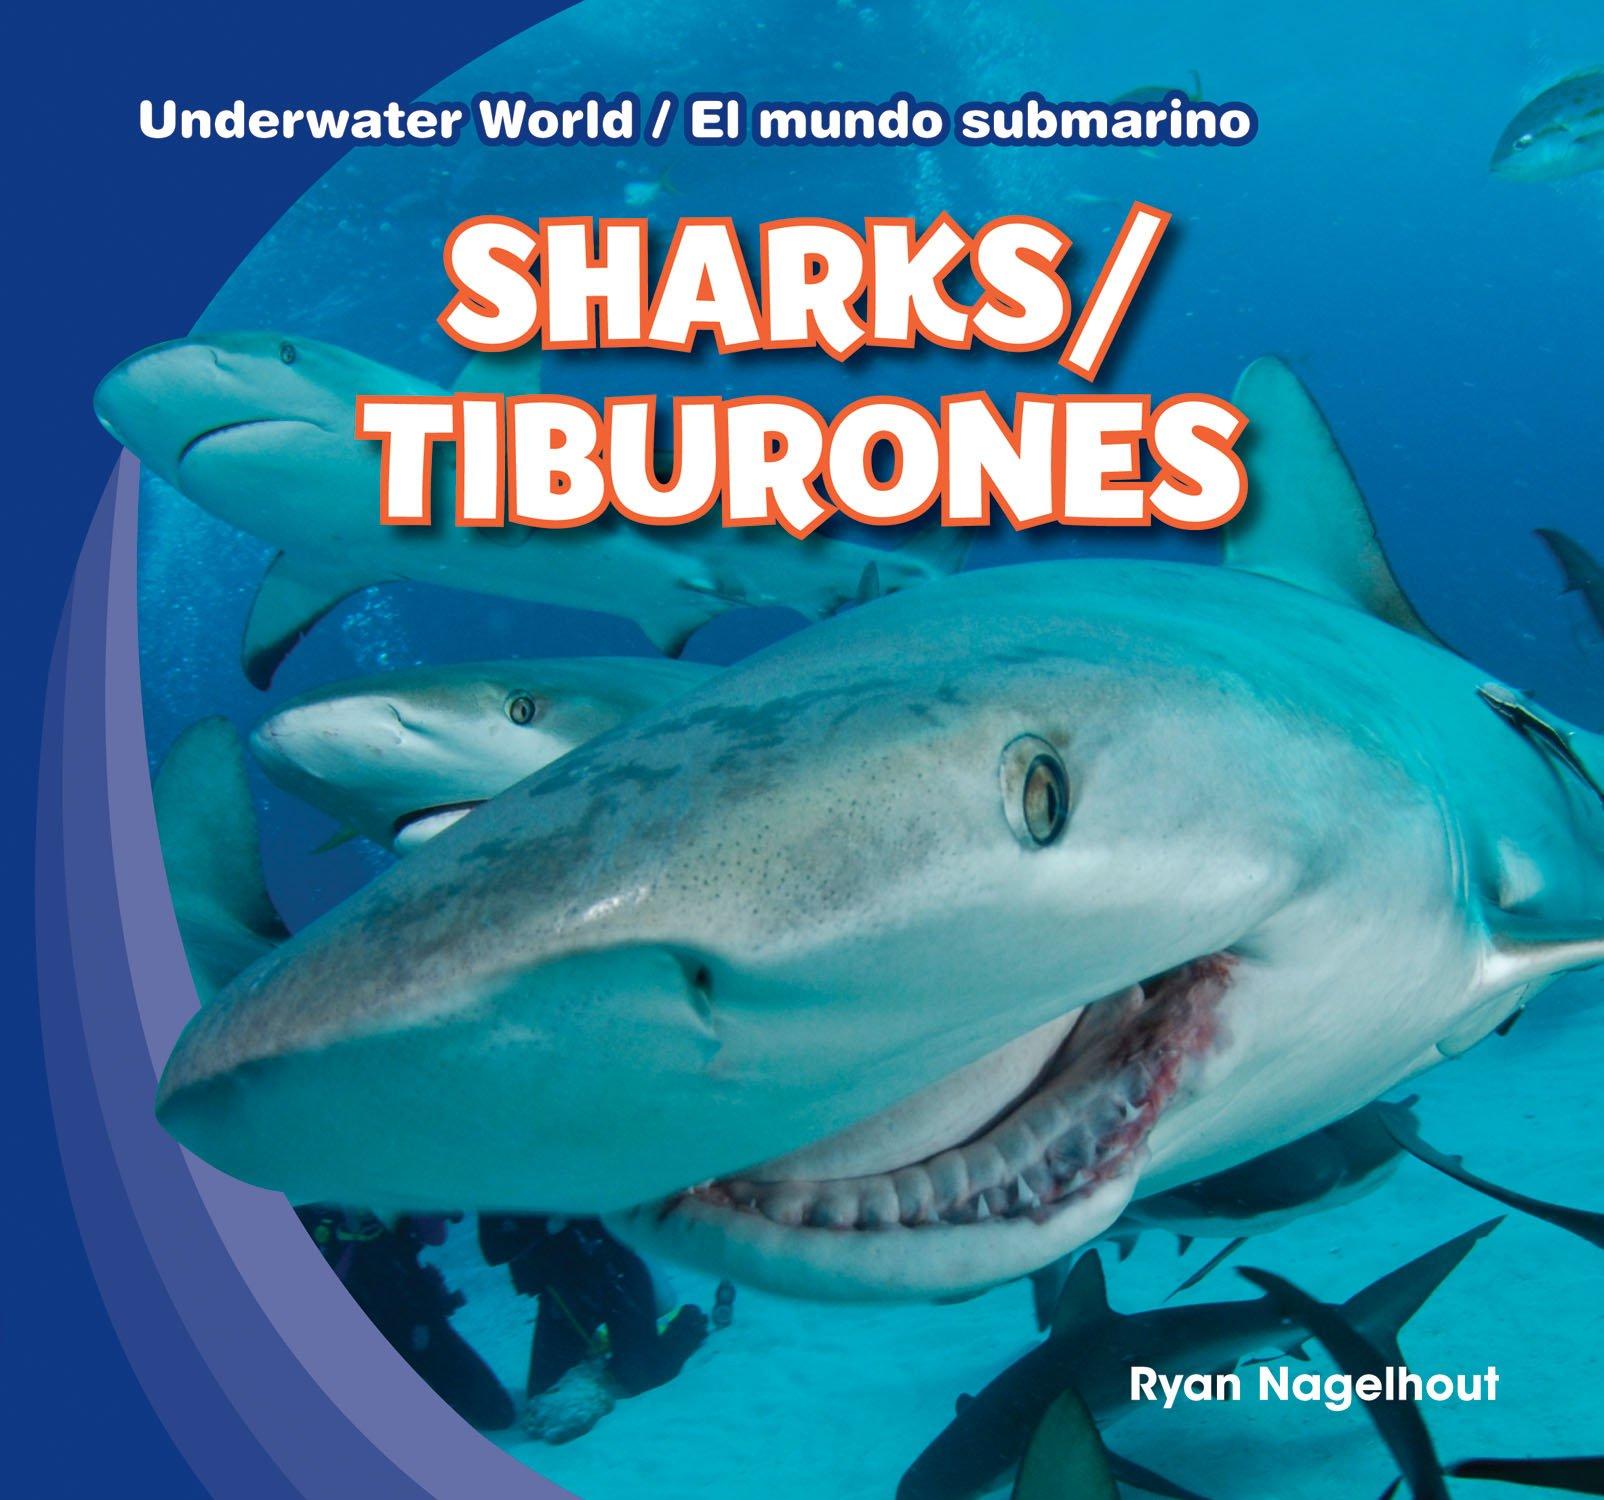 Sharks / Tiburones (Underwater World / El Mundo Submarino) (English and Spanish Edition) by Brand: Gareth Stevens Publishing